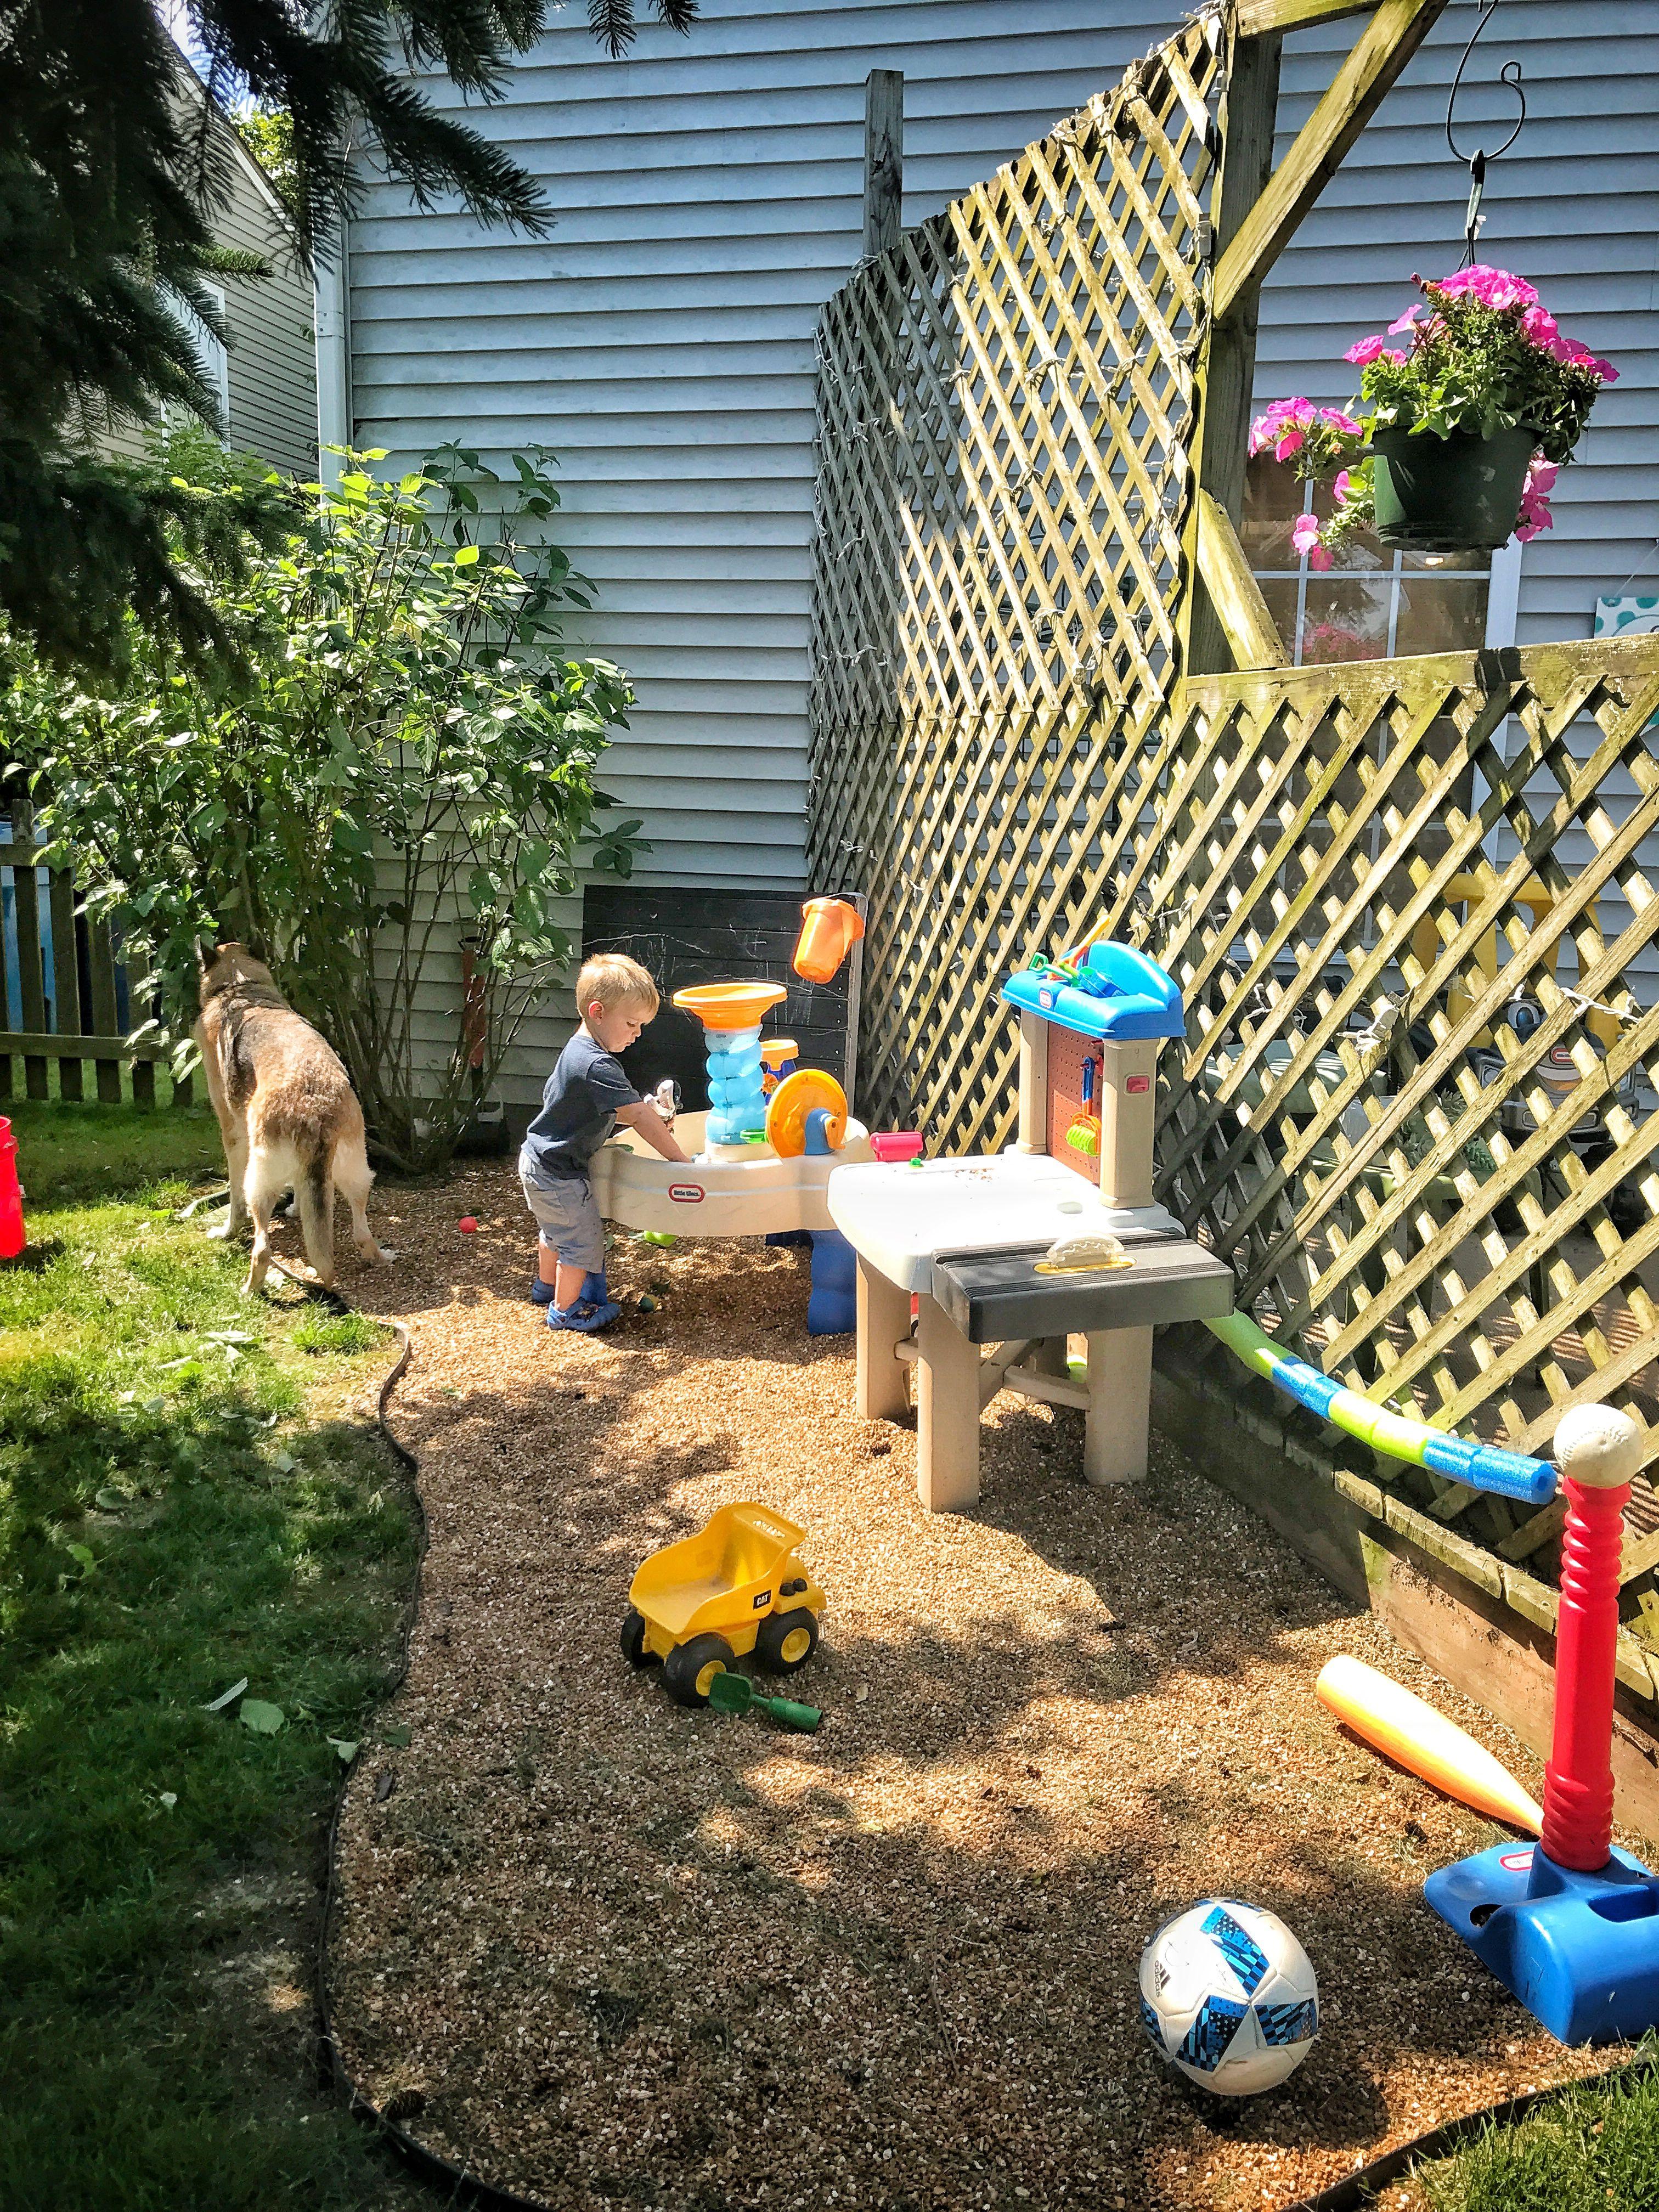 Backyard Kids Play Area Pea Gravel For Trucks And Chalk Board Paint Backyard For Kids